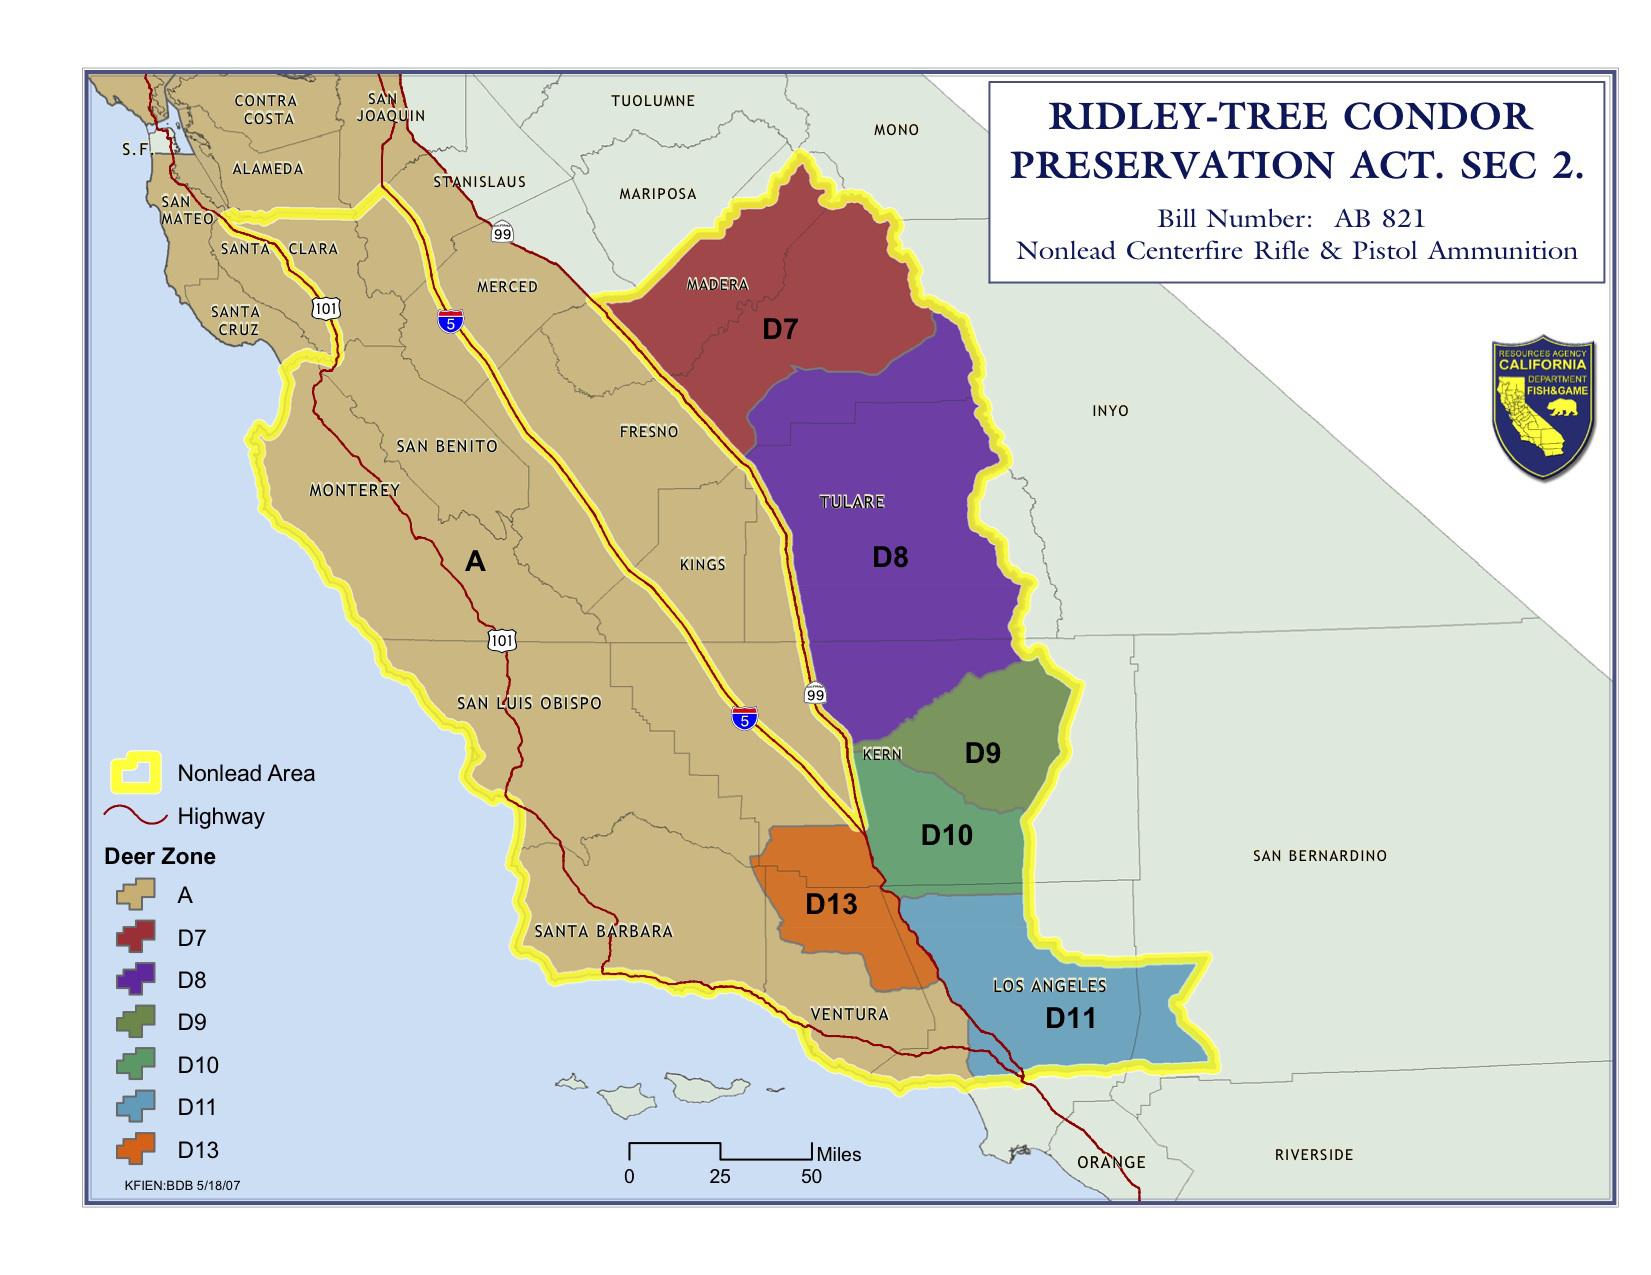 California Condor Range Hunting Legal Labrador And Upland Map - California Hunting Map